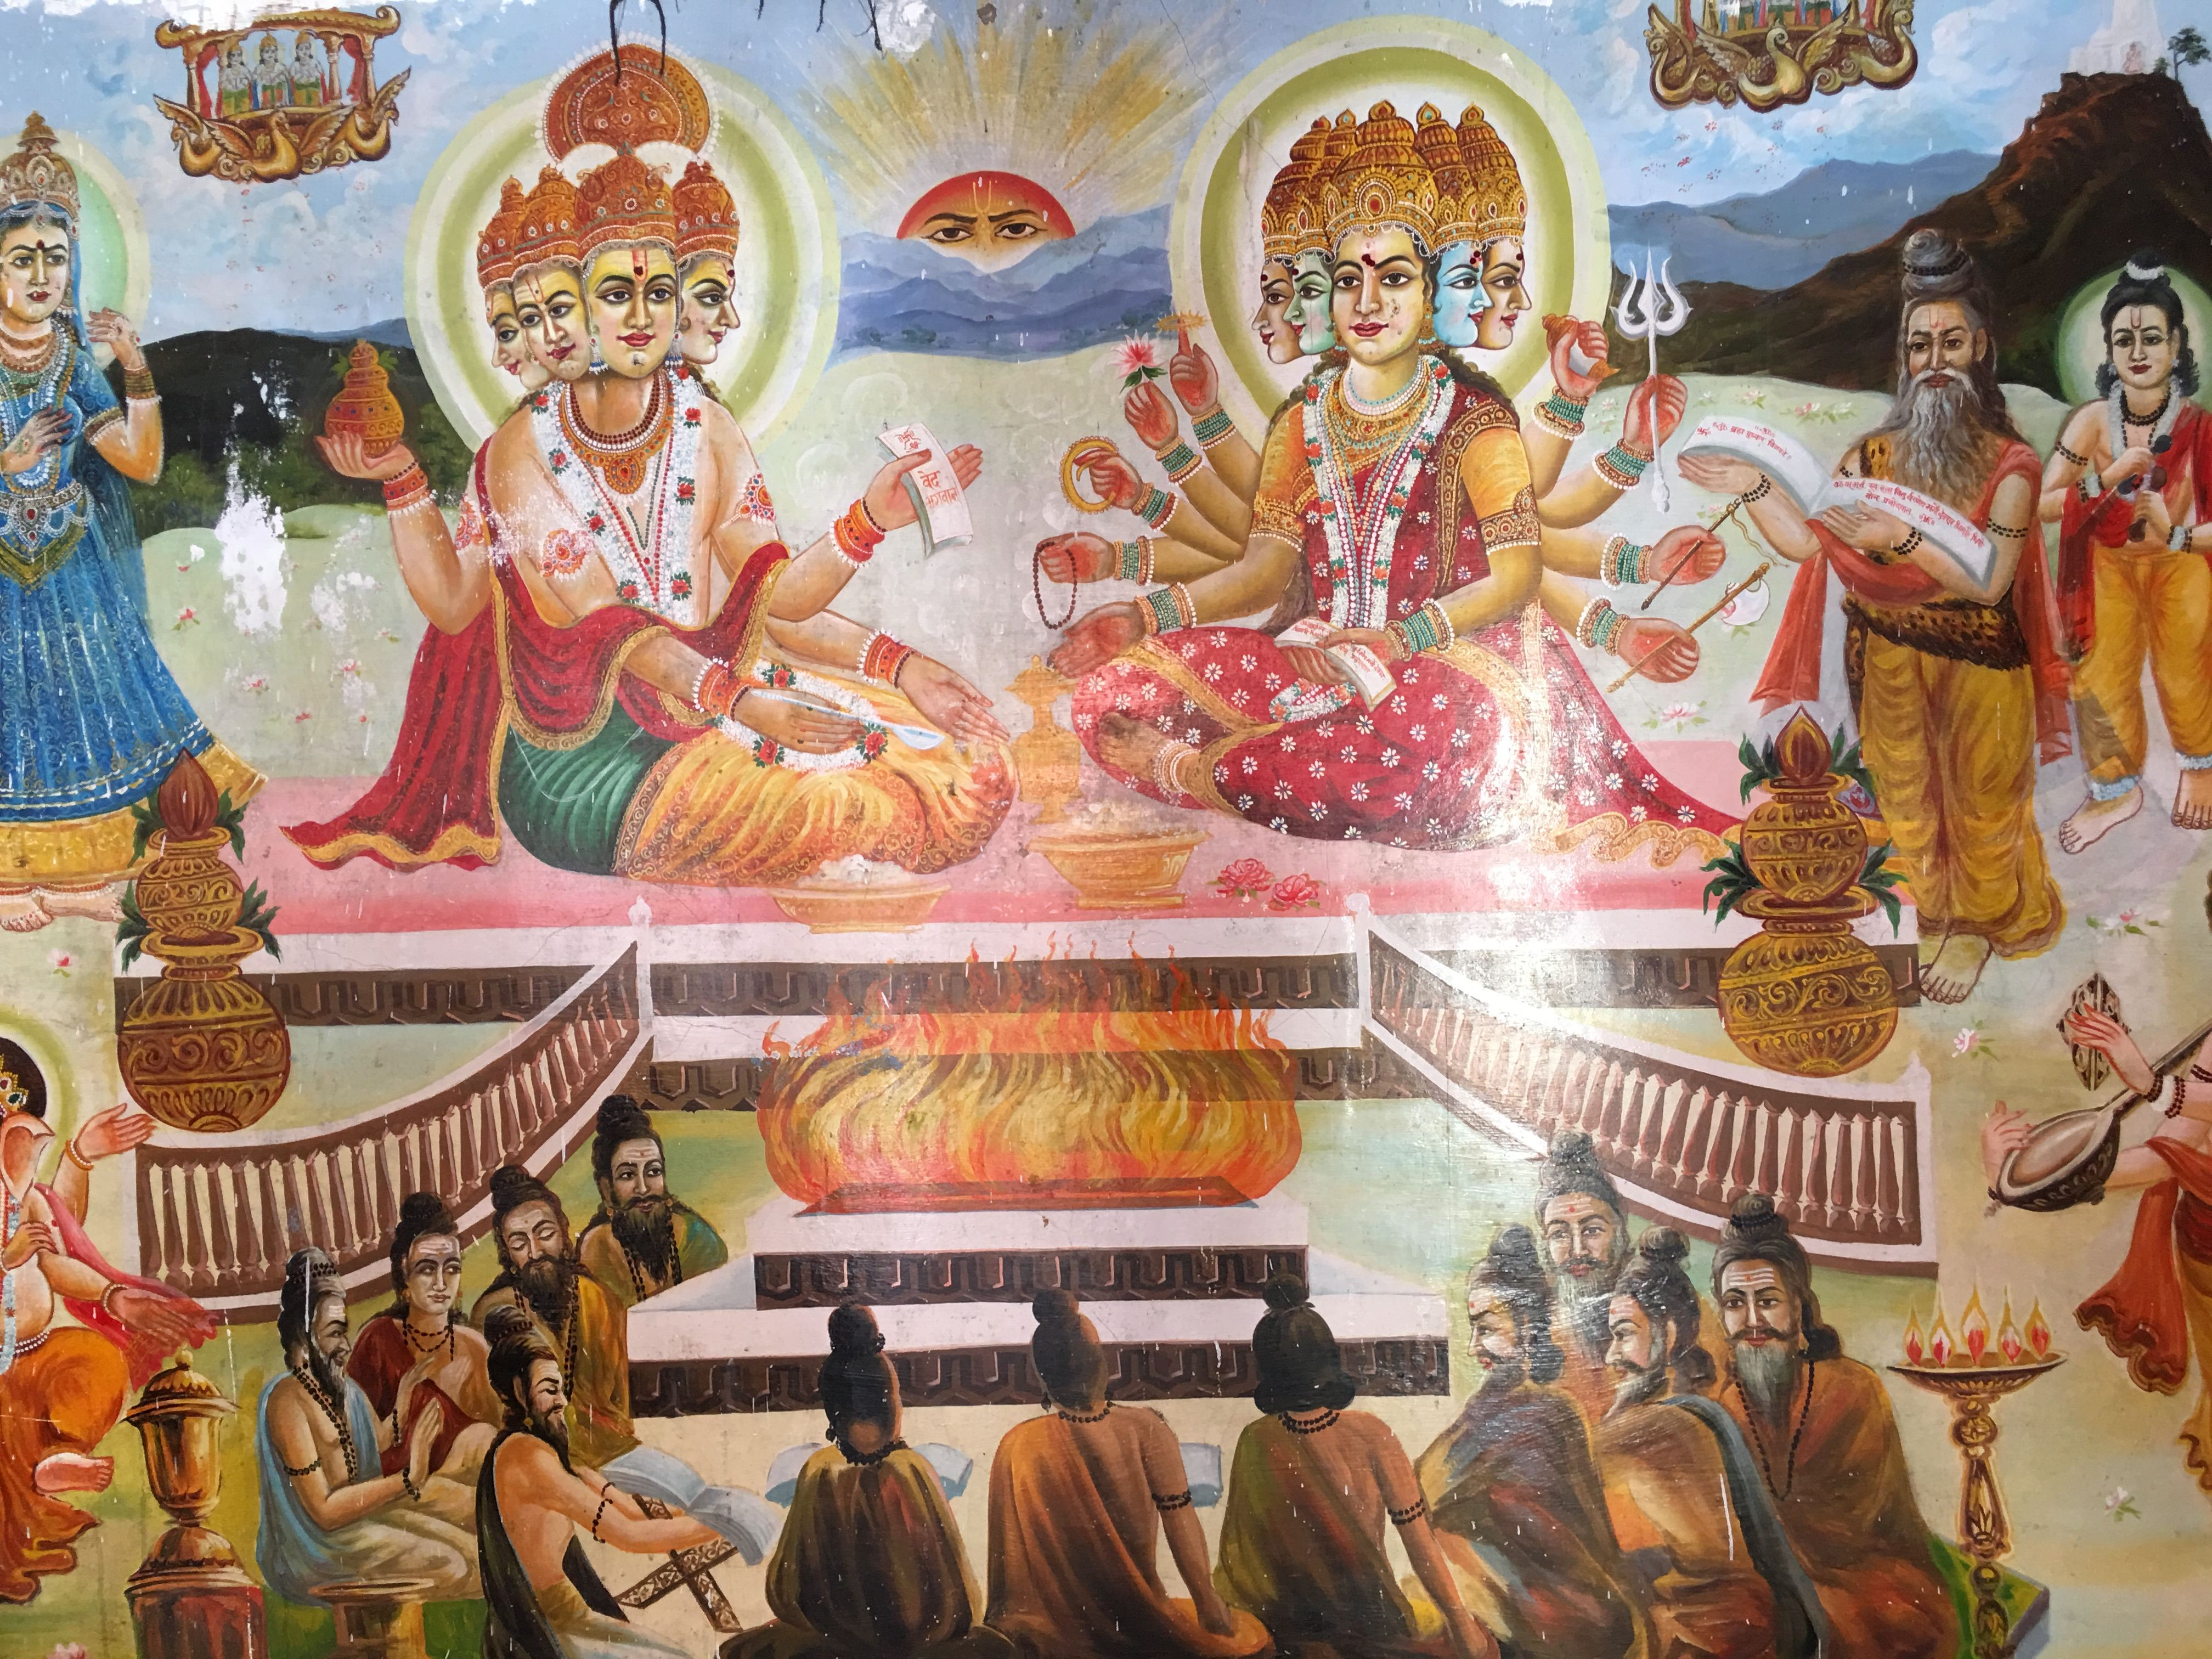 Templo de Brahma em Pushkar